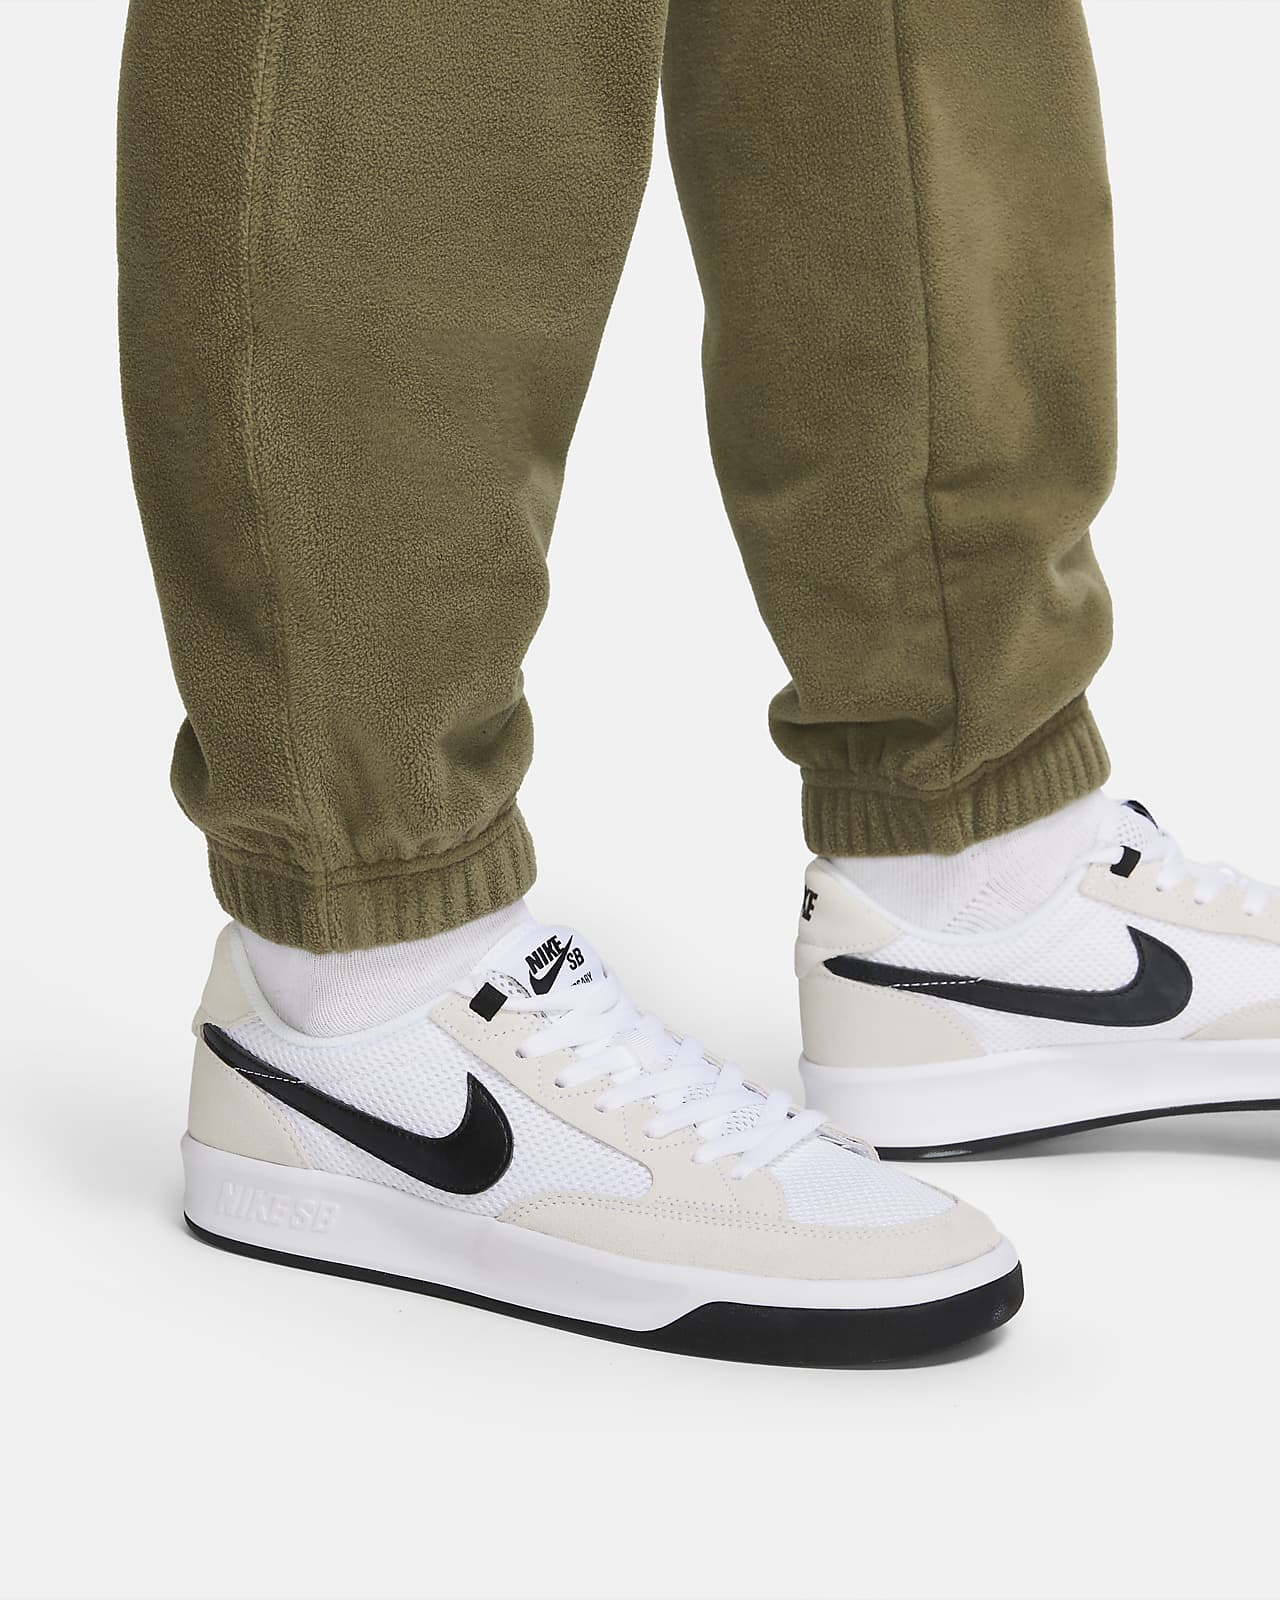 Pantalon cargo de skateboard Nike SB pour Homme